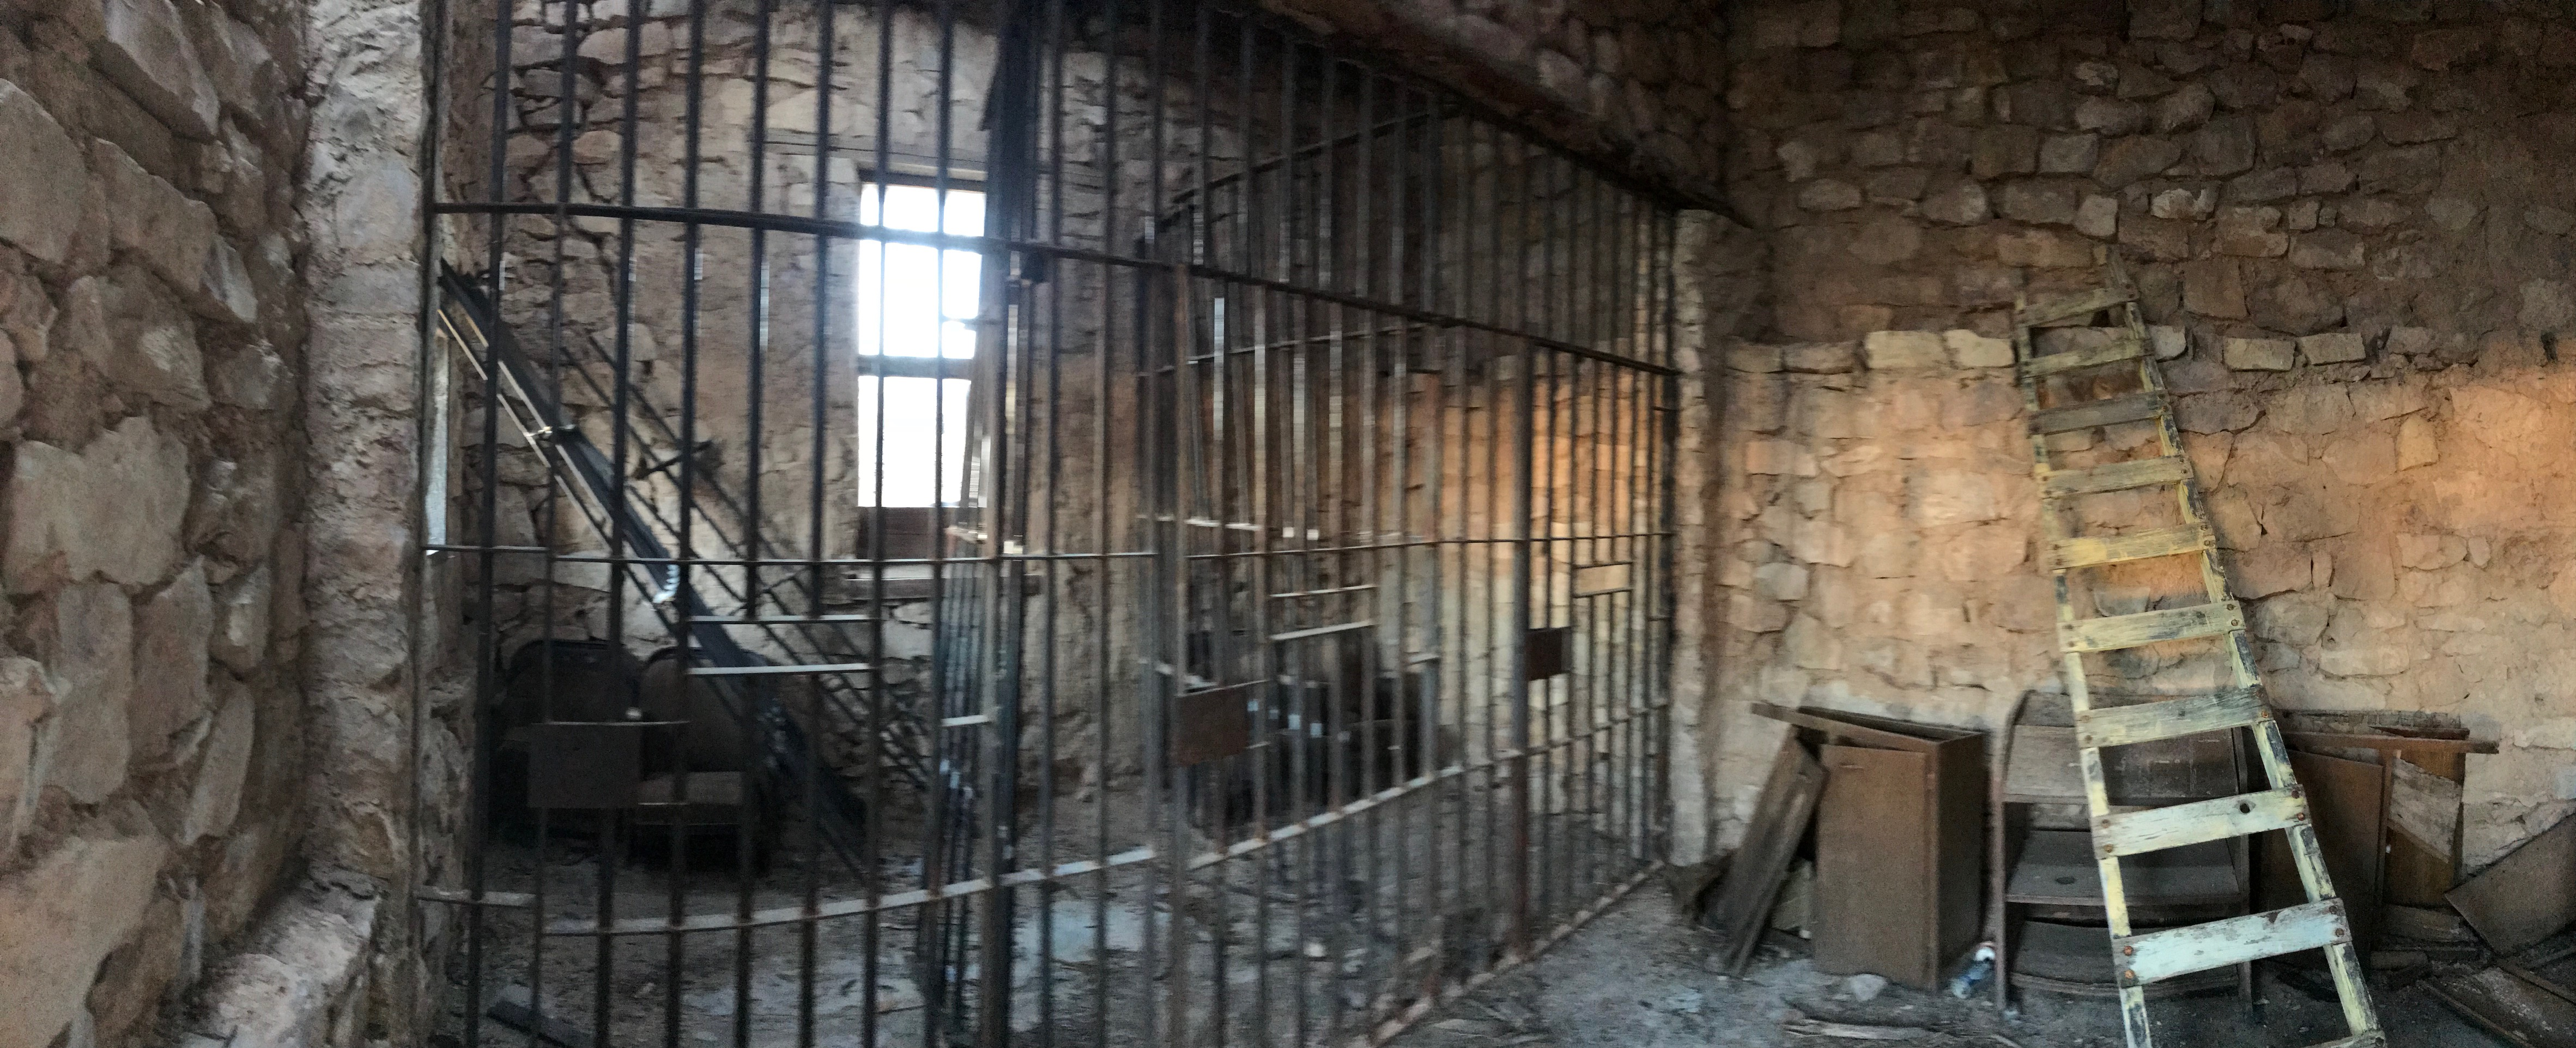 3 jail cells total in rock building